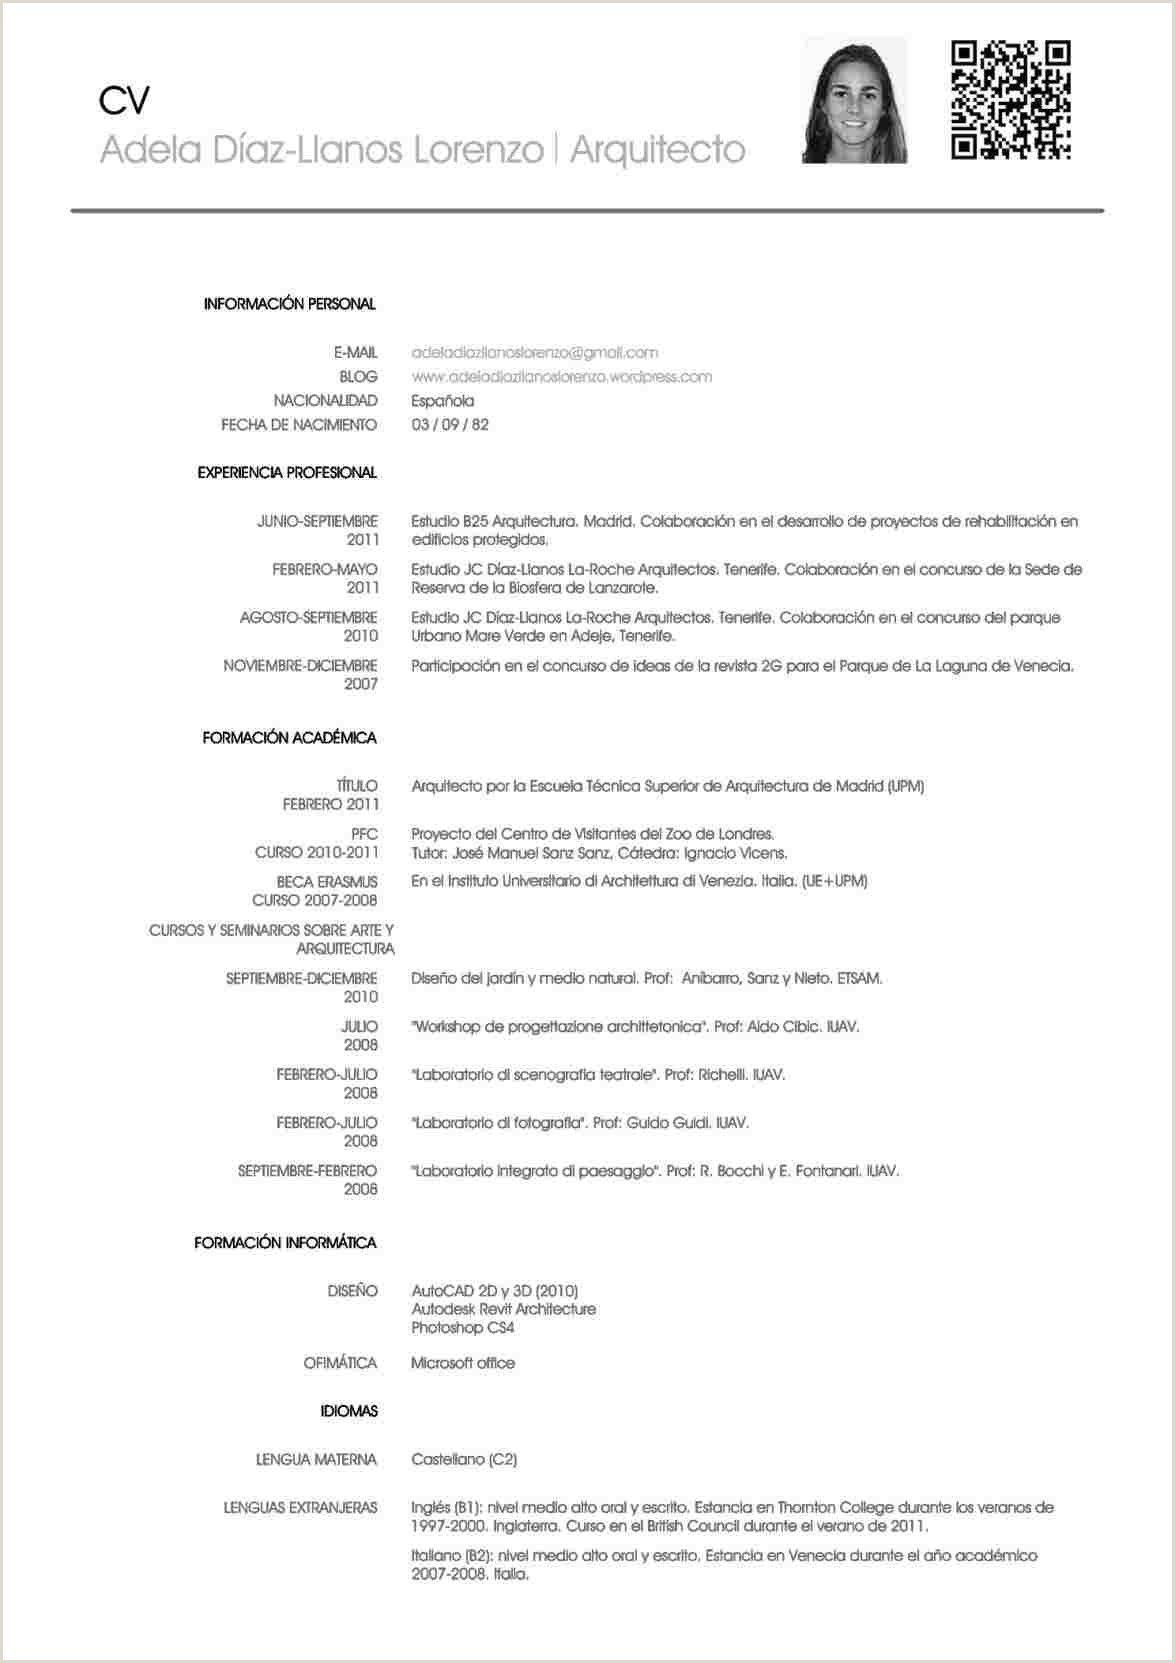 Curriculum Vitae Para Rellenar Gratis En Espanol Curriculum Vitae Resume Words Resume